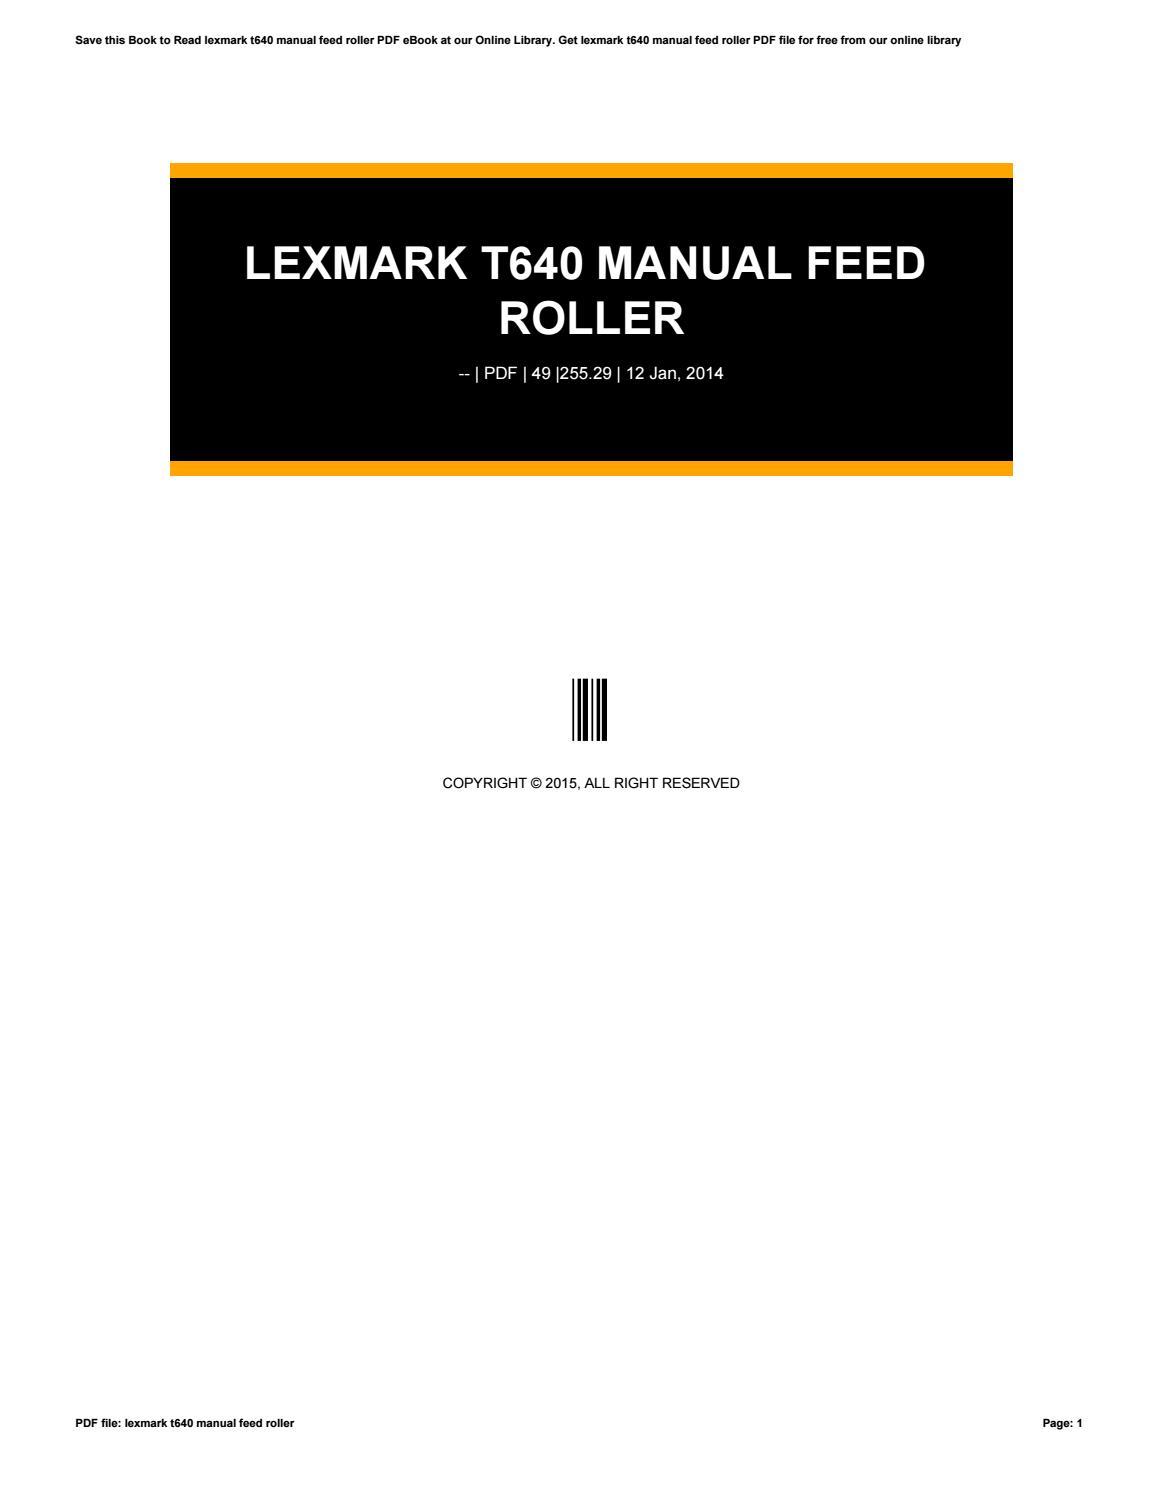 lexmark t640 manual pdf